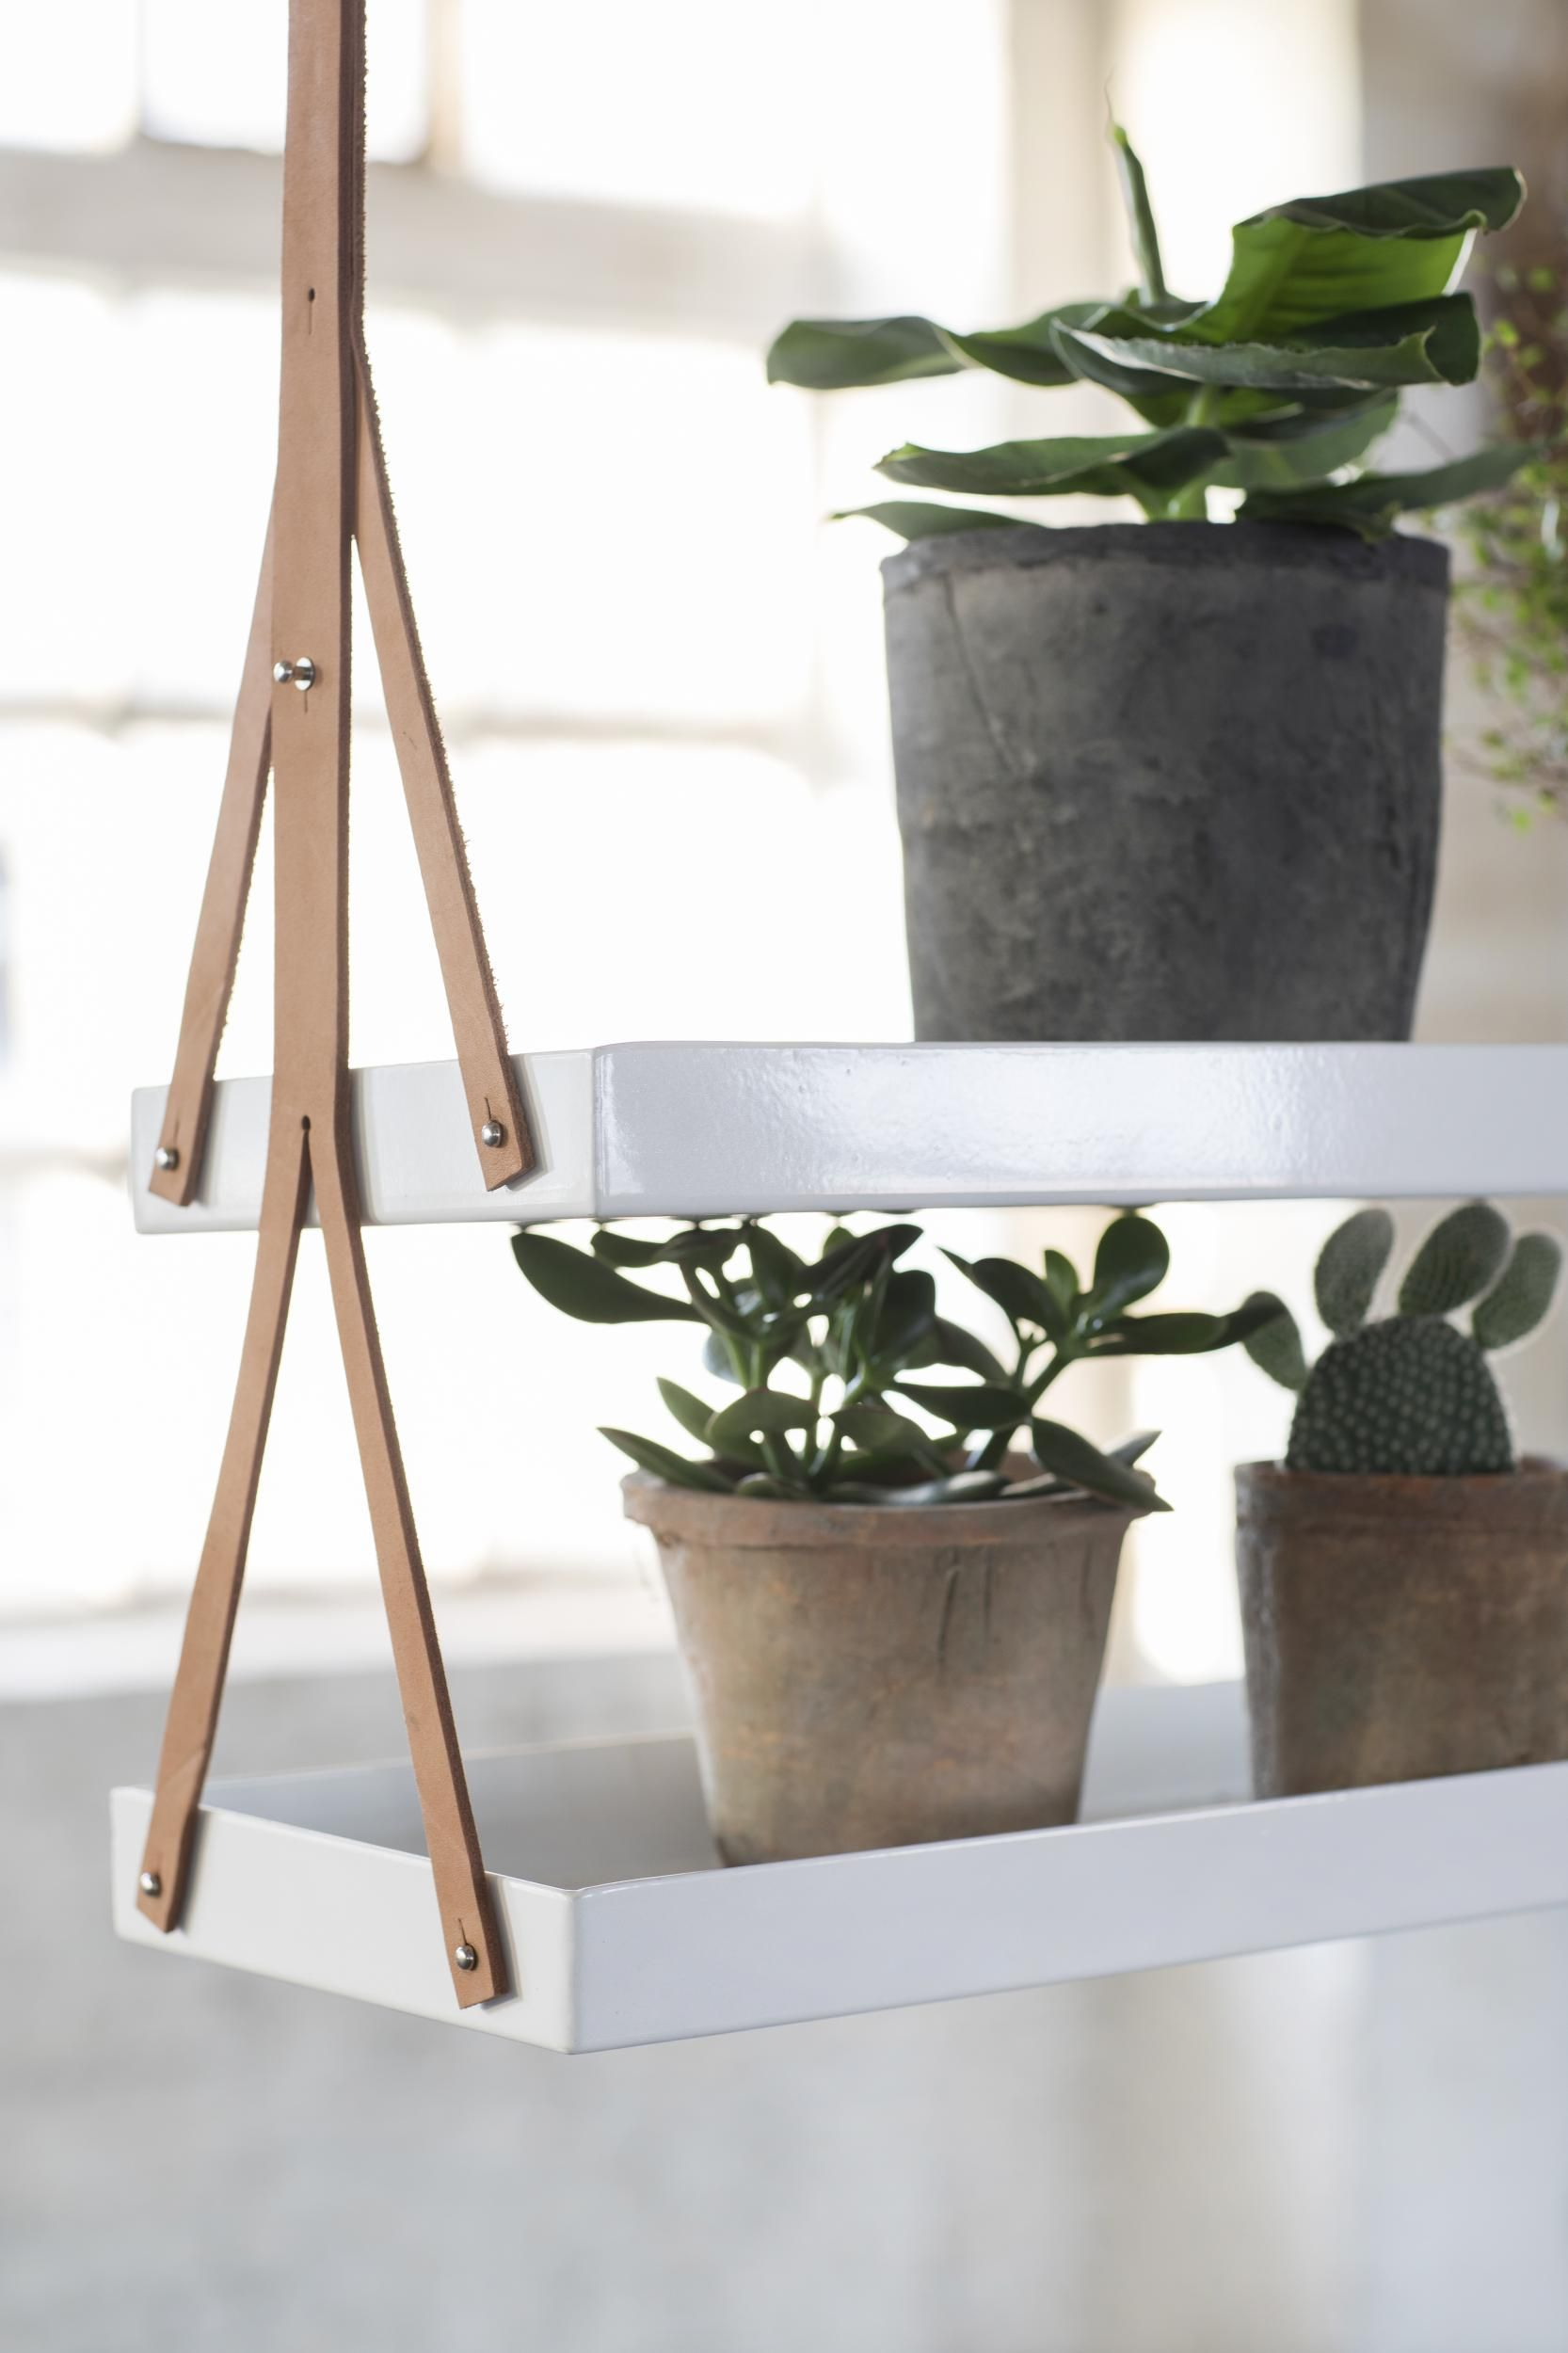 etag re bretelle suspendre cuivre cuir l 115 cm. Black Bedroom Furniture Sets. Home Design Ideas